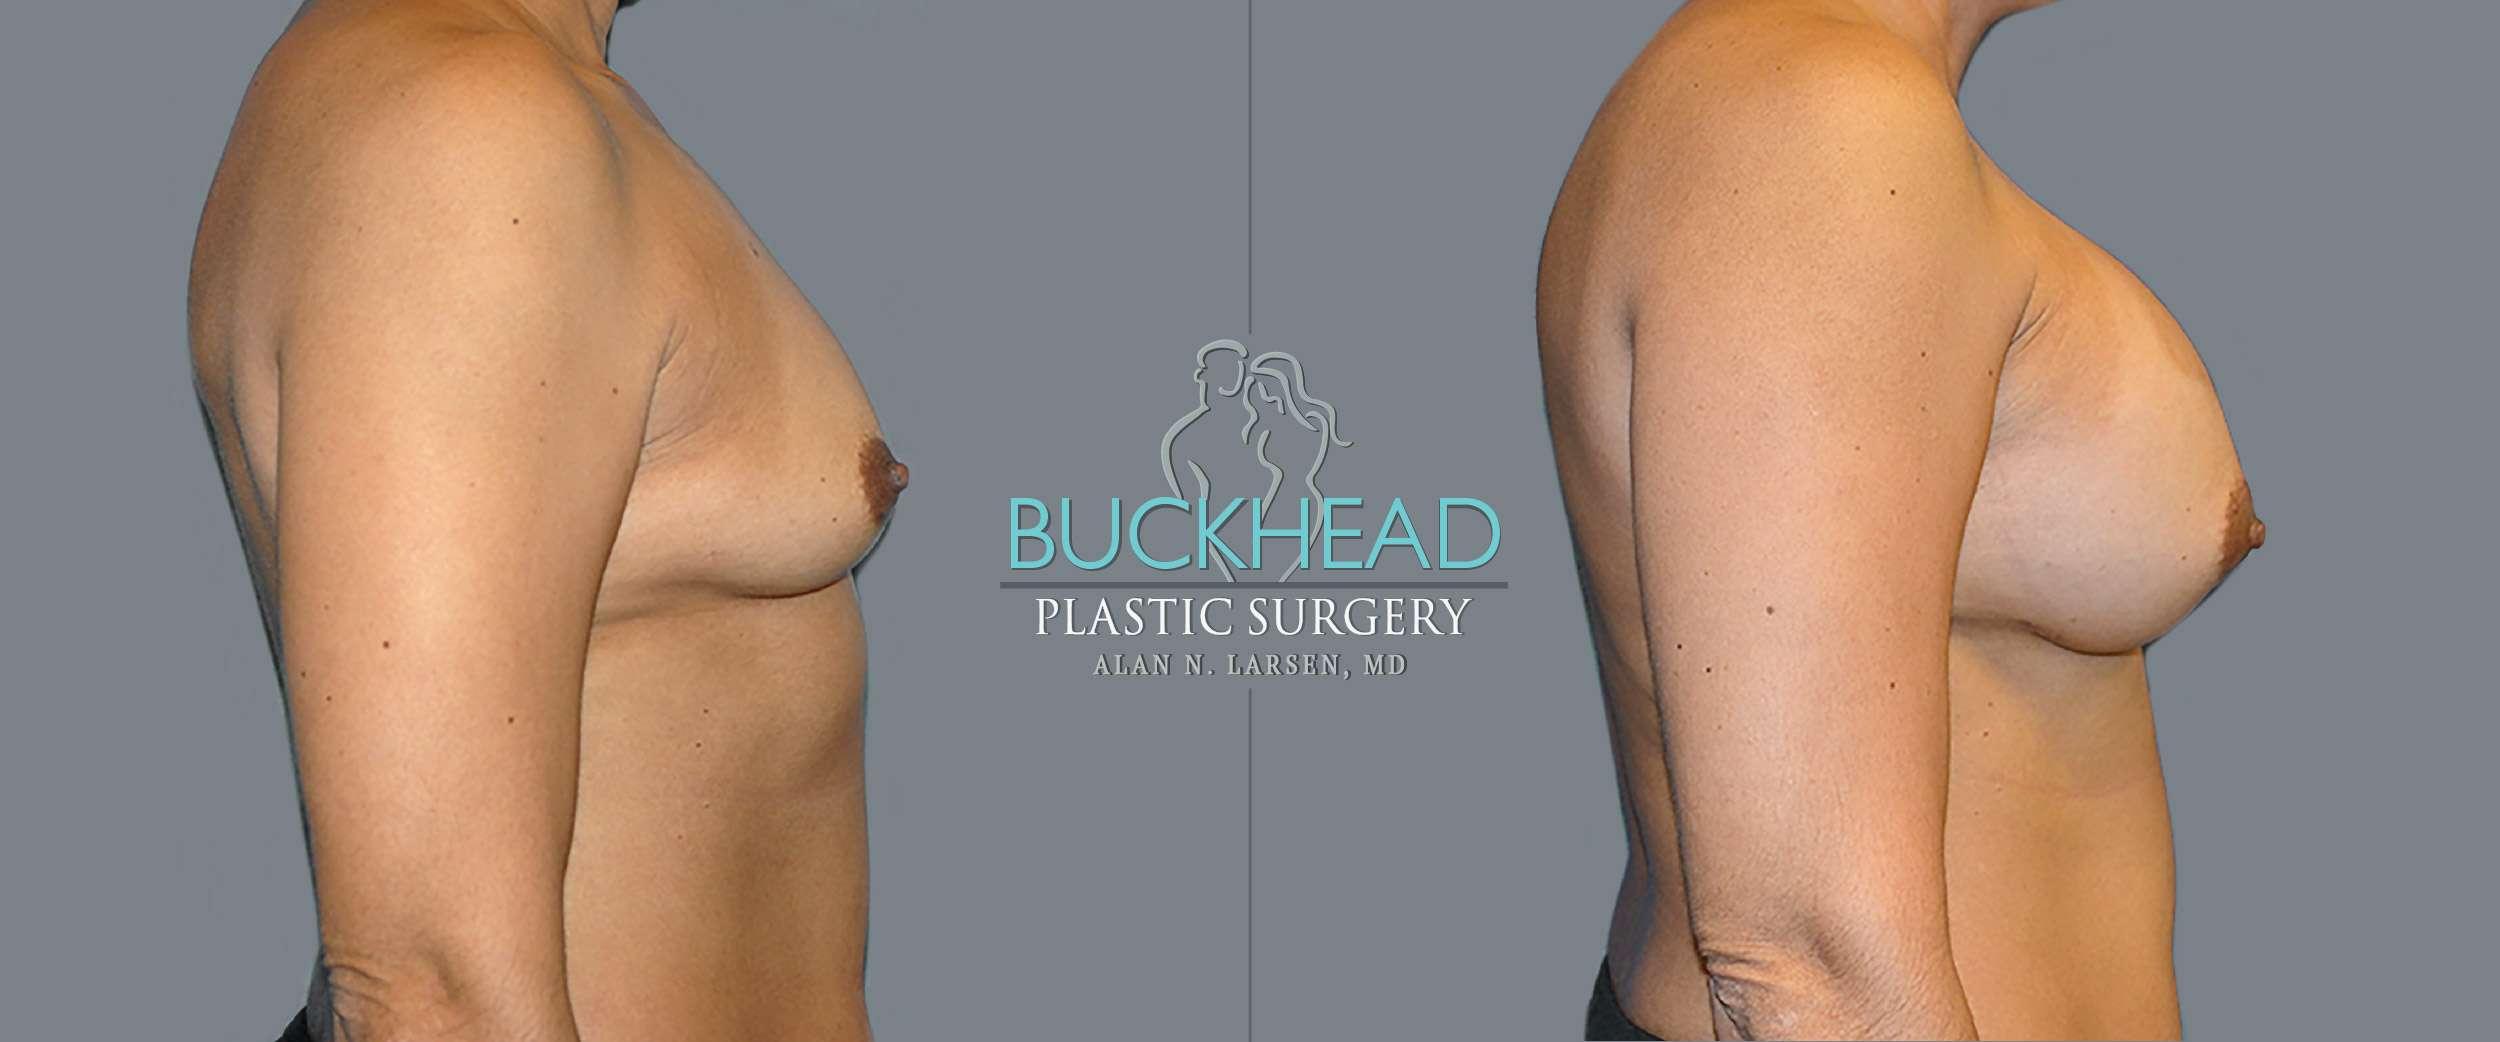 Before and After Photo Gallery | Breast Augmentation | Buckhead Plastic Surgery | Alan N. Larsen, MD | Board-Certified Plastic Surgeon in Atlanta GA